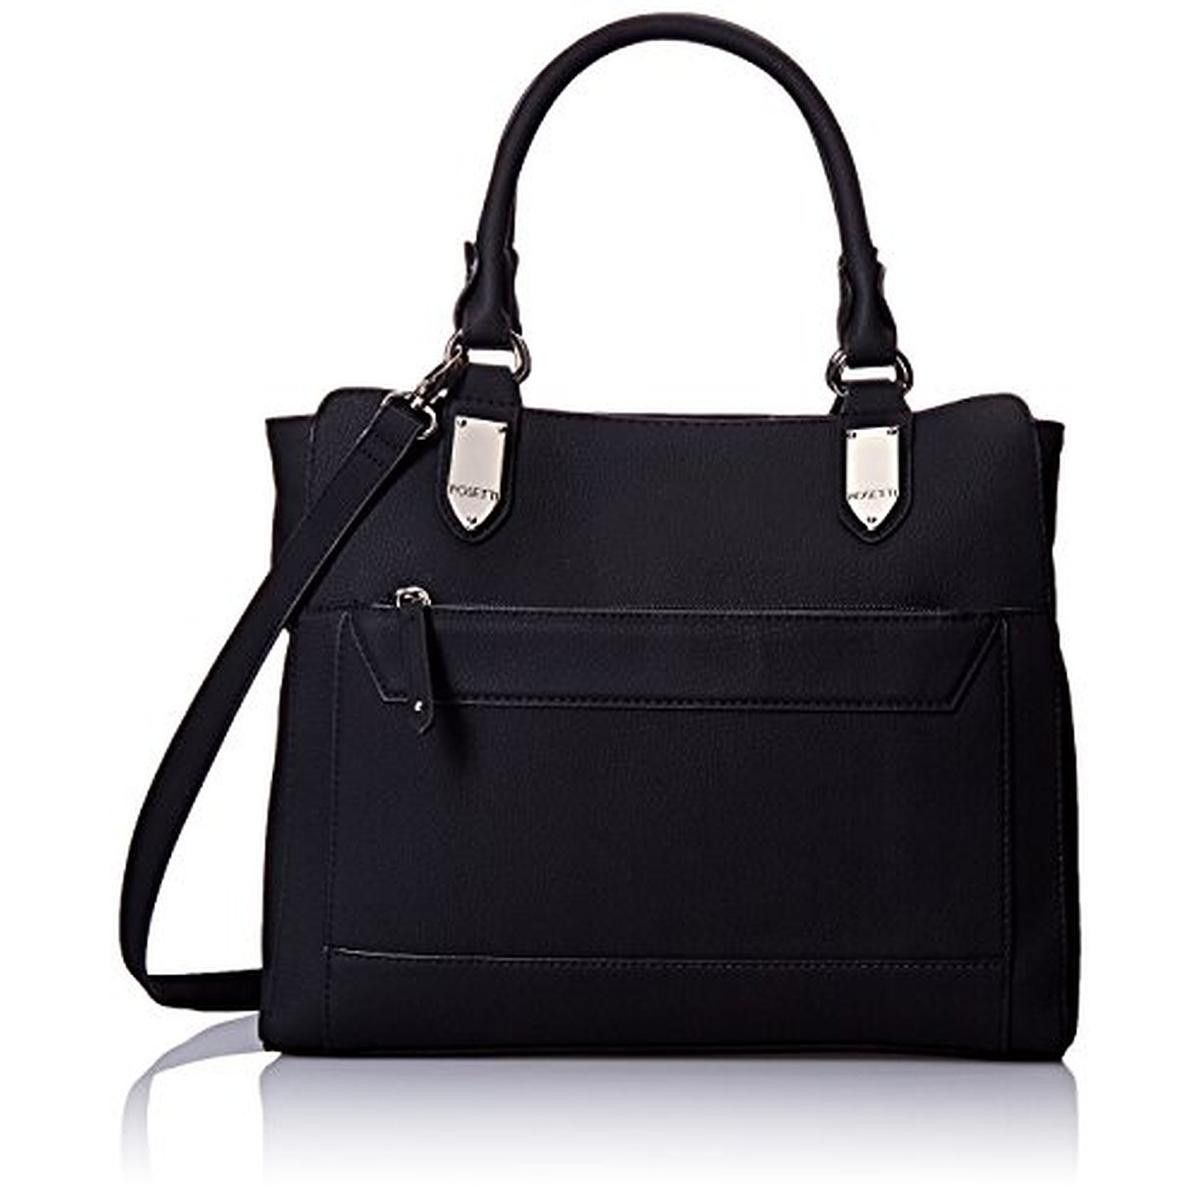 Rosetti Womens Cameron Faux Leather Convertible Tote Handbag